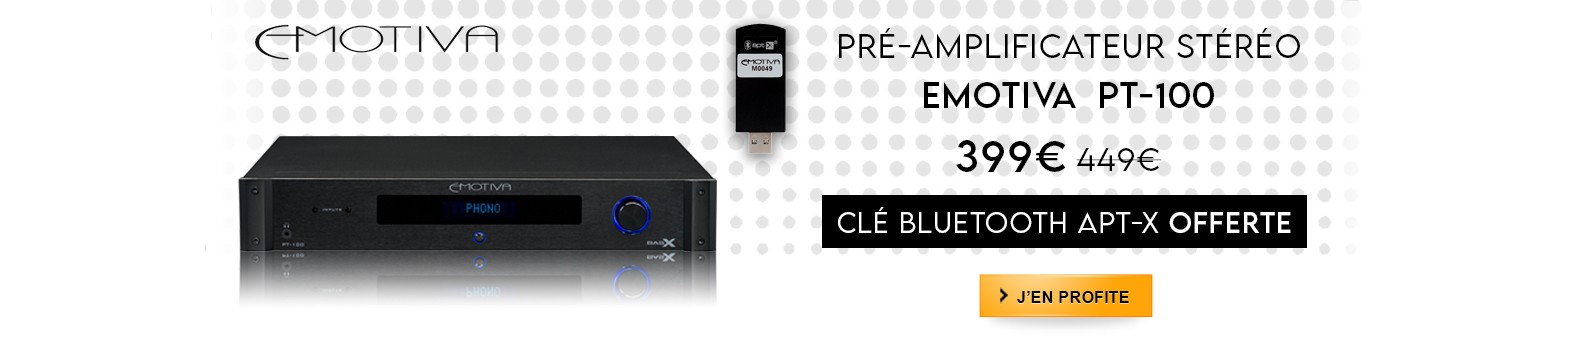 Pré-ampli/DAC stéréo Emotiva PT-100 en promotion ! Dongle Bluetooth offert